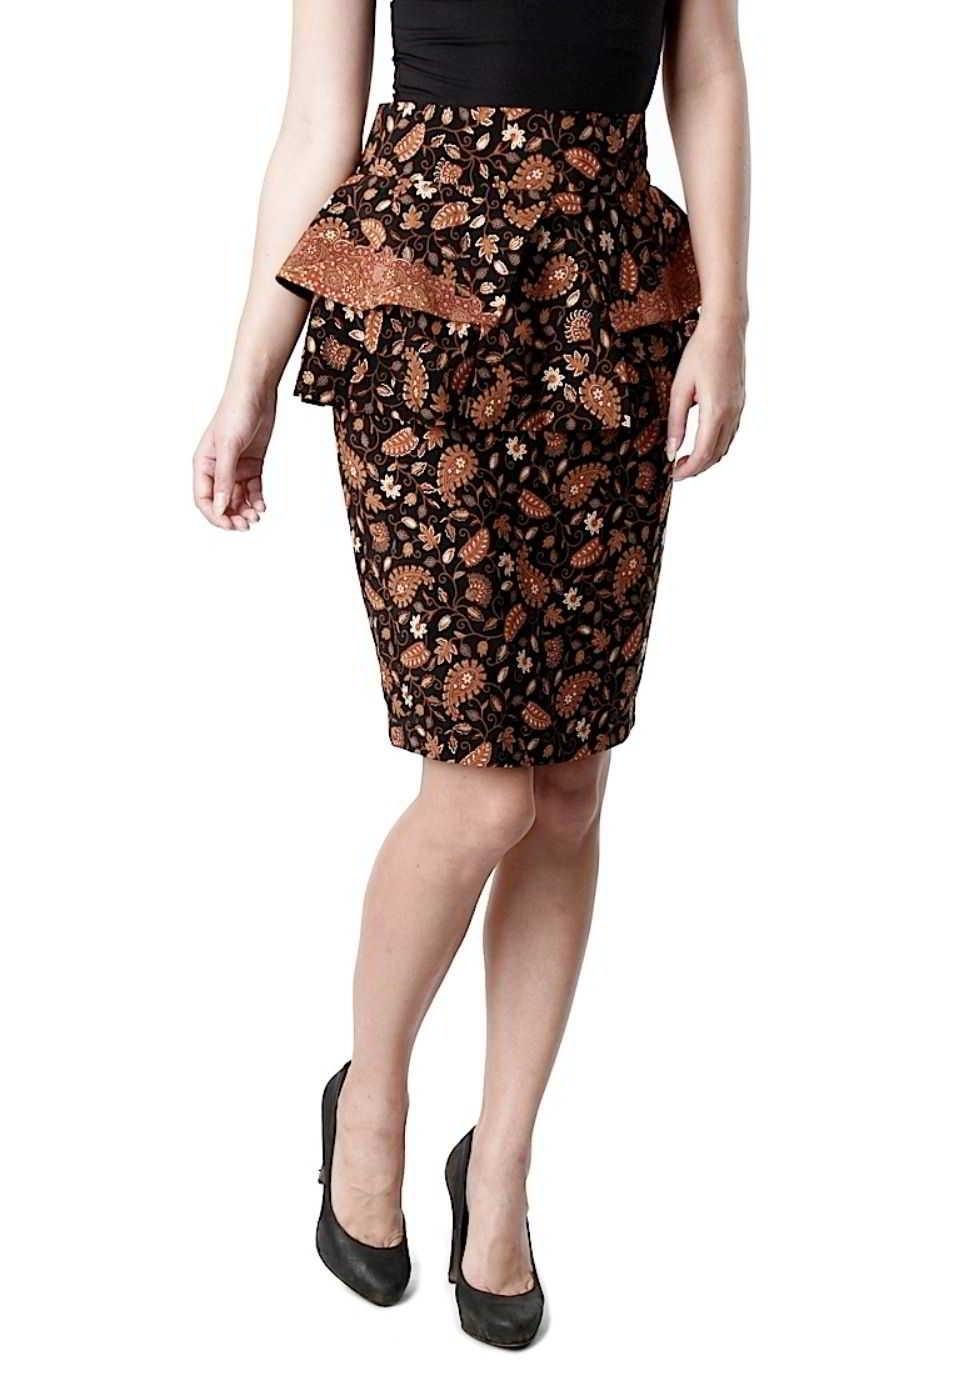 Model Baju Batik untuk Pesta Pernikahan dengan Gaya Rok Pendek